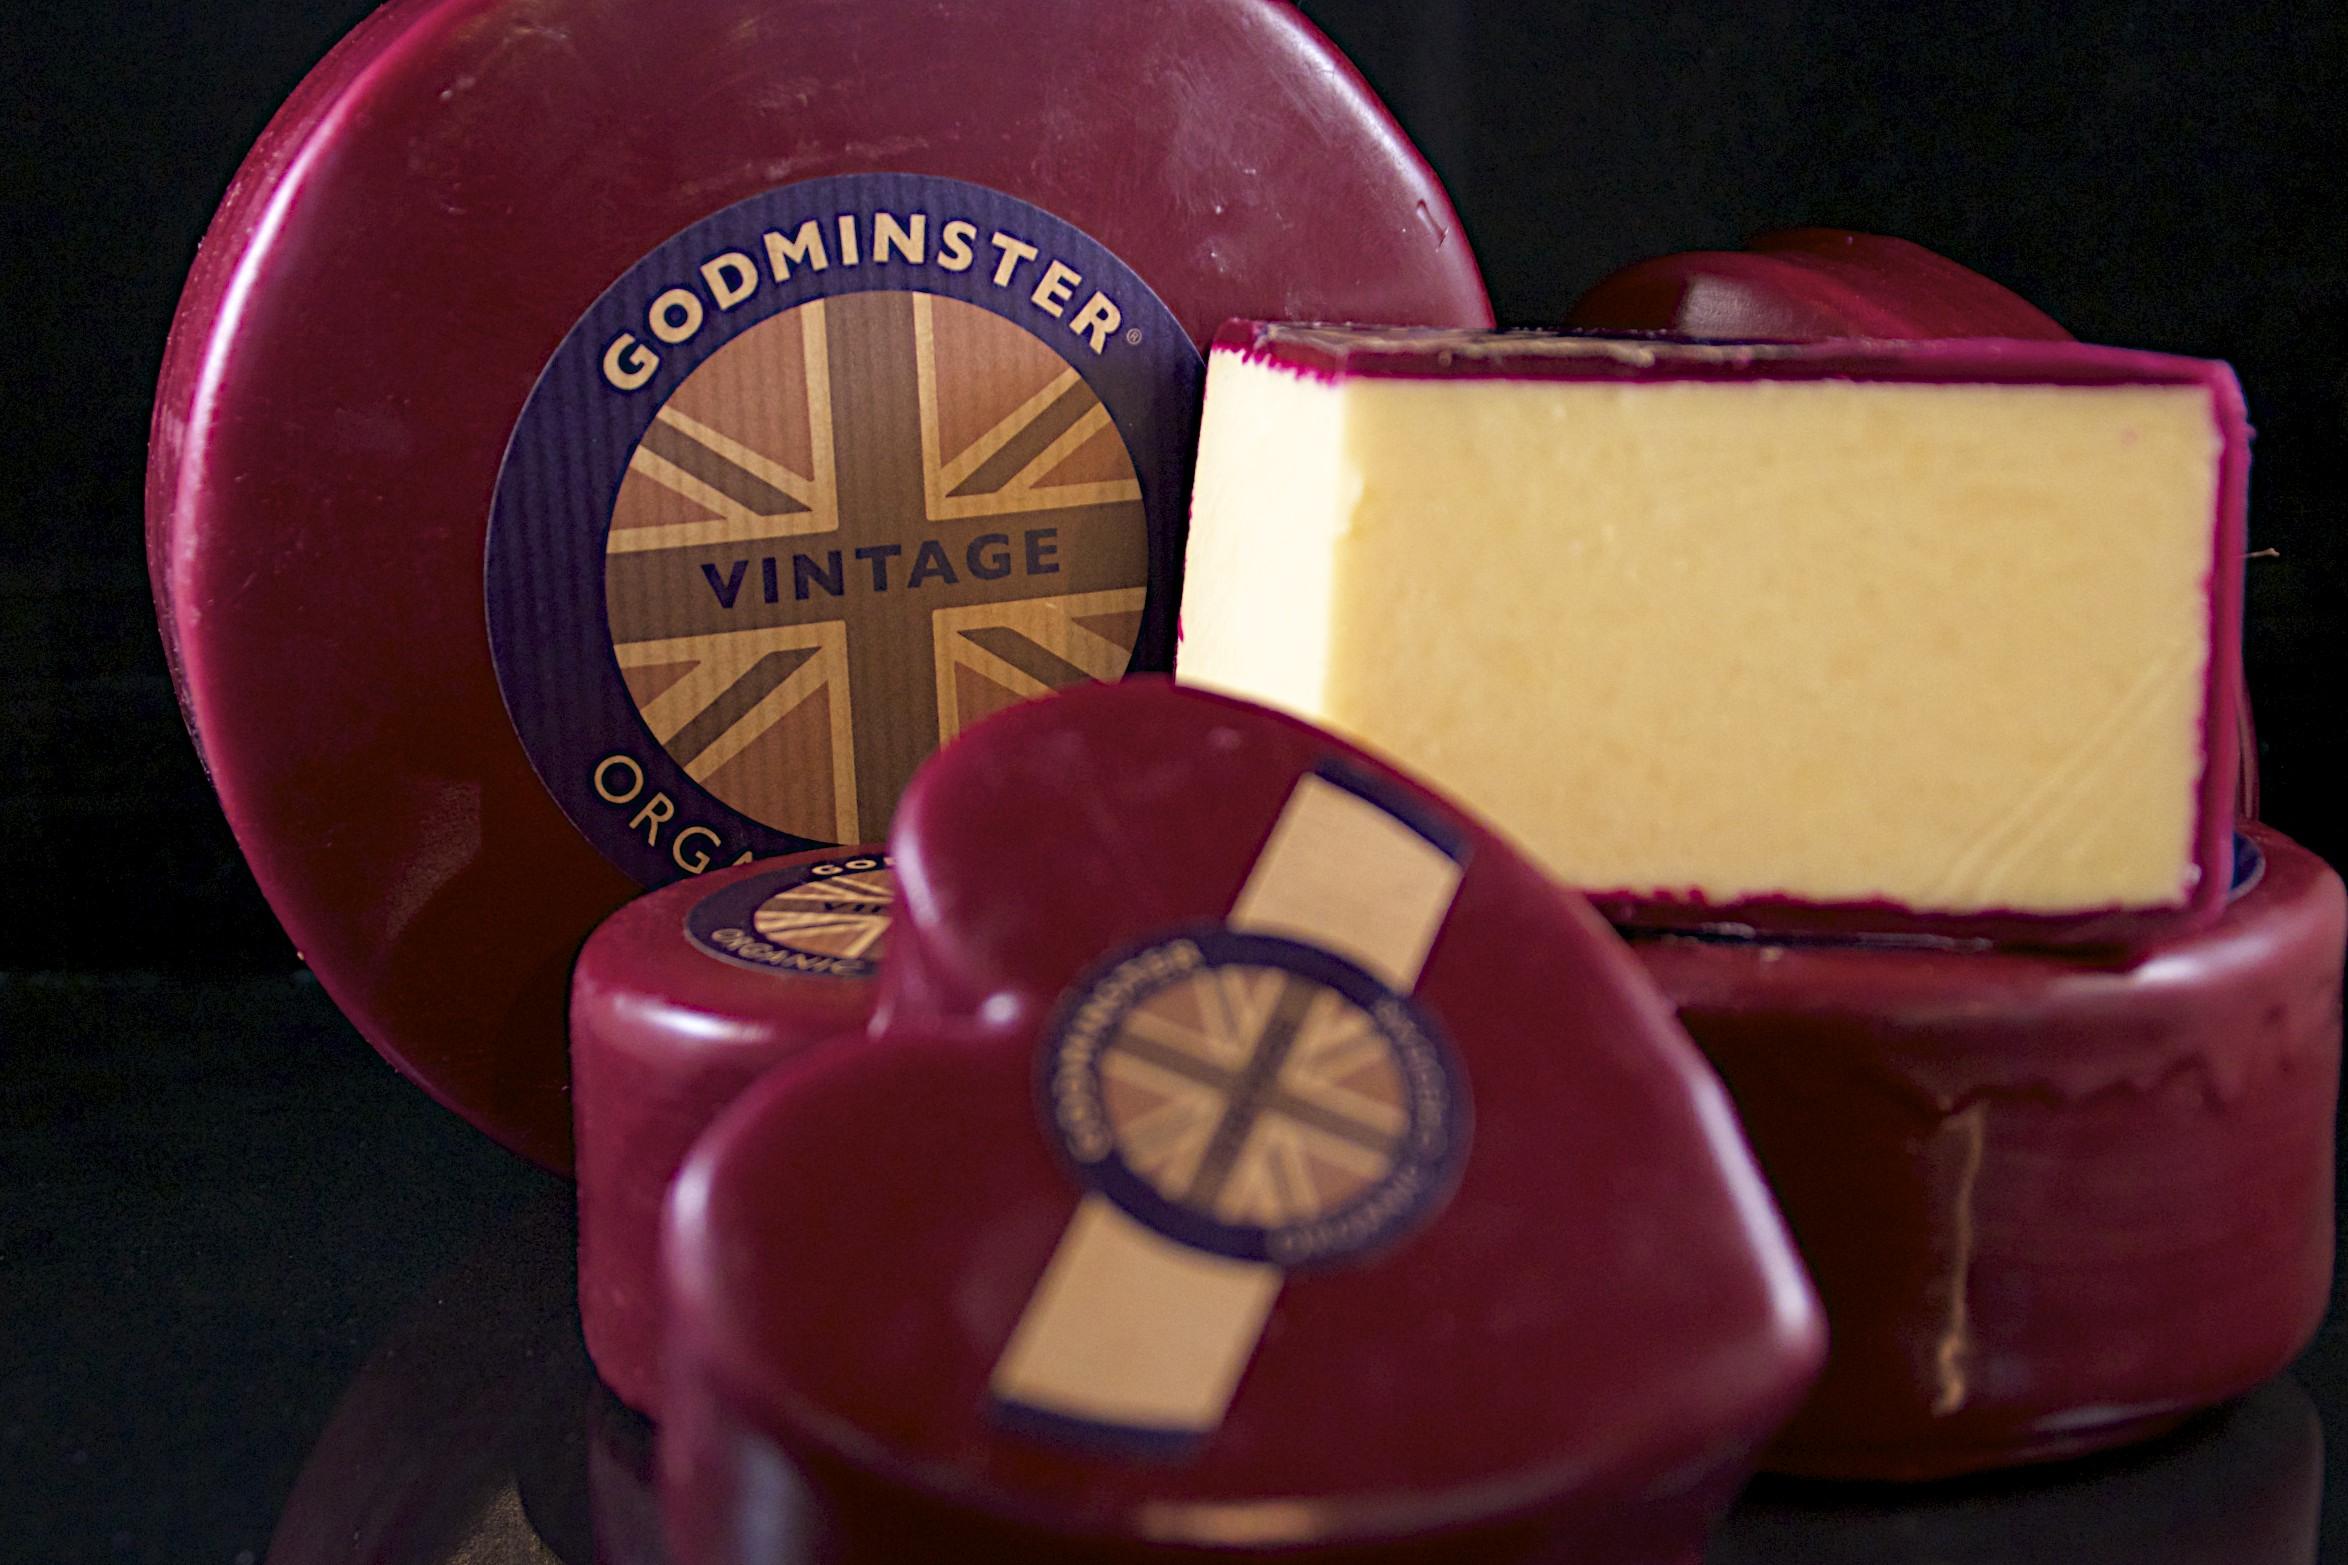 Godminster Cheese - Organic Cheddar